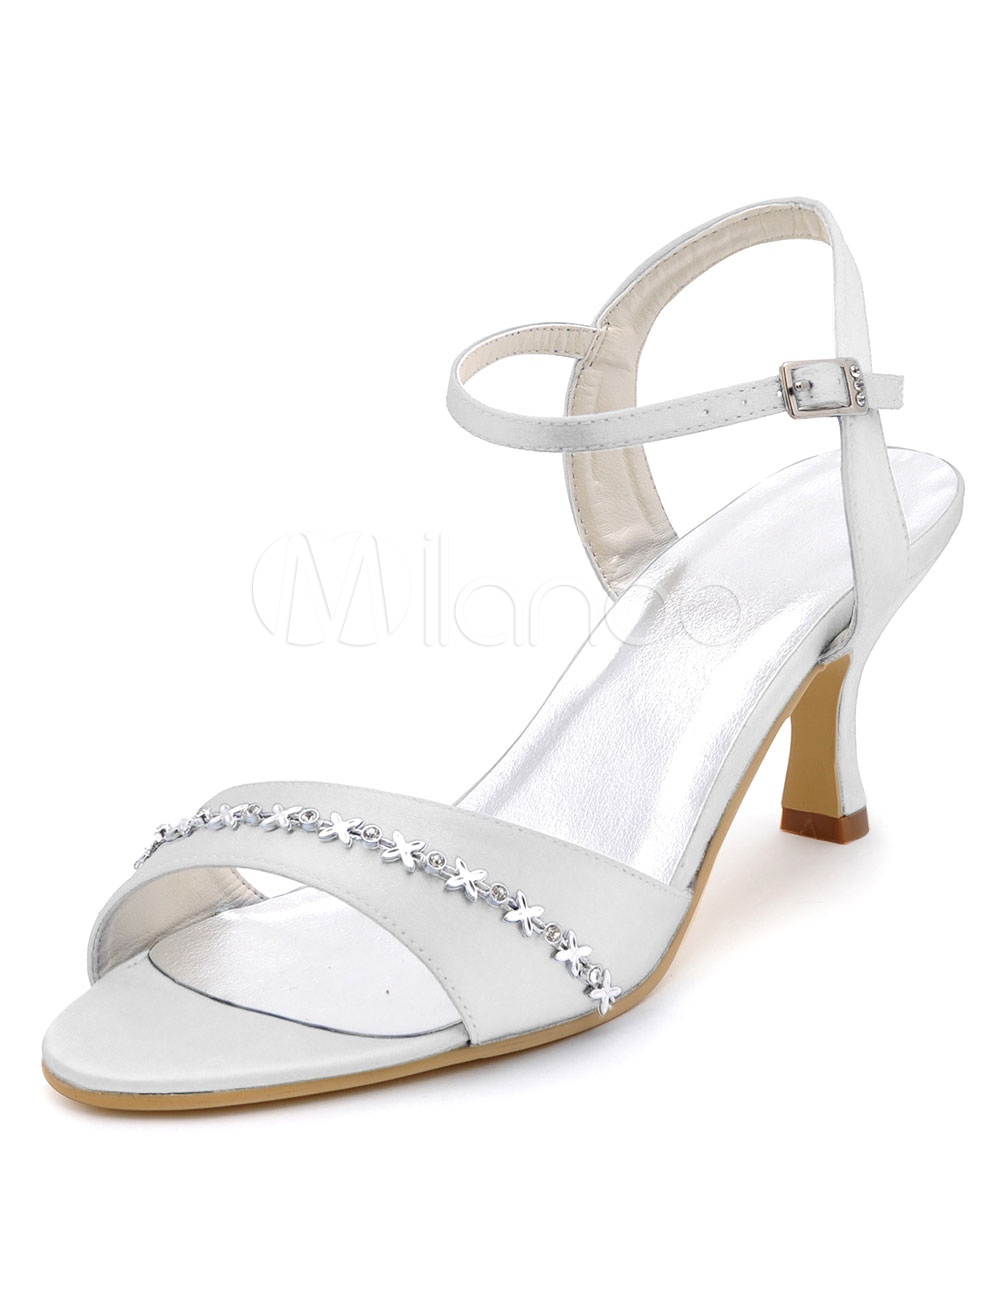 Zapatos De Abierto De Boda Alto Toe Decoración Sandalias Tacón Cadena De Blanco Nupcial pfwqf